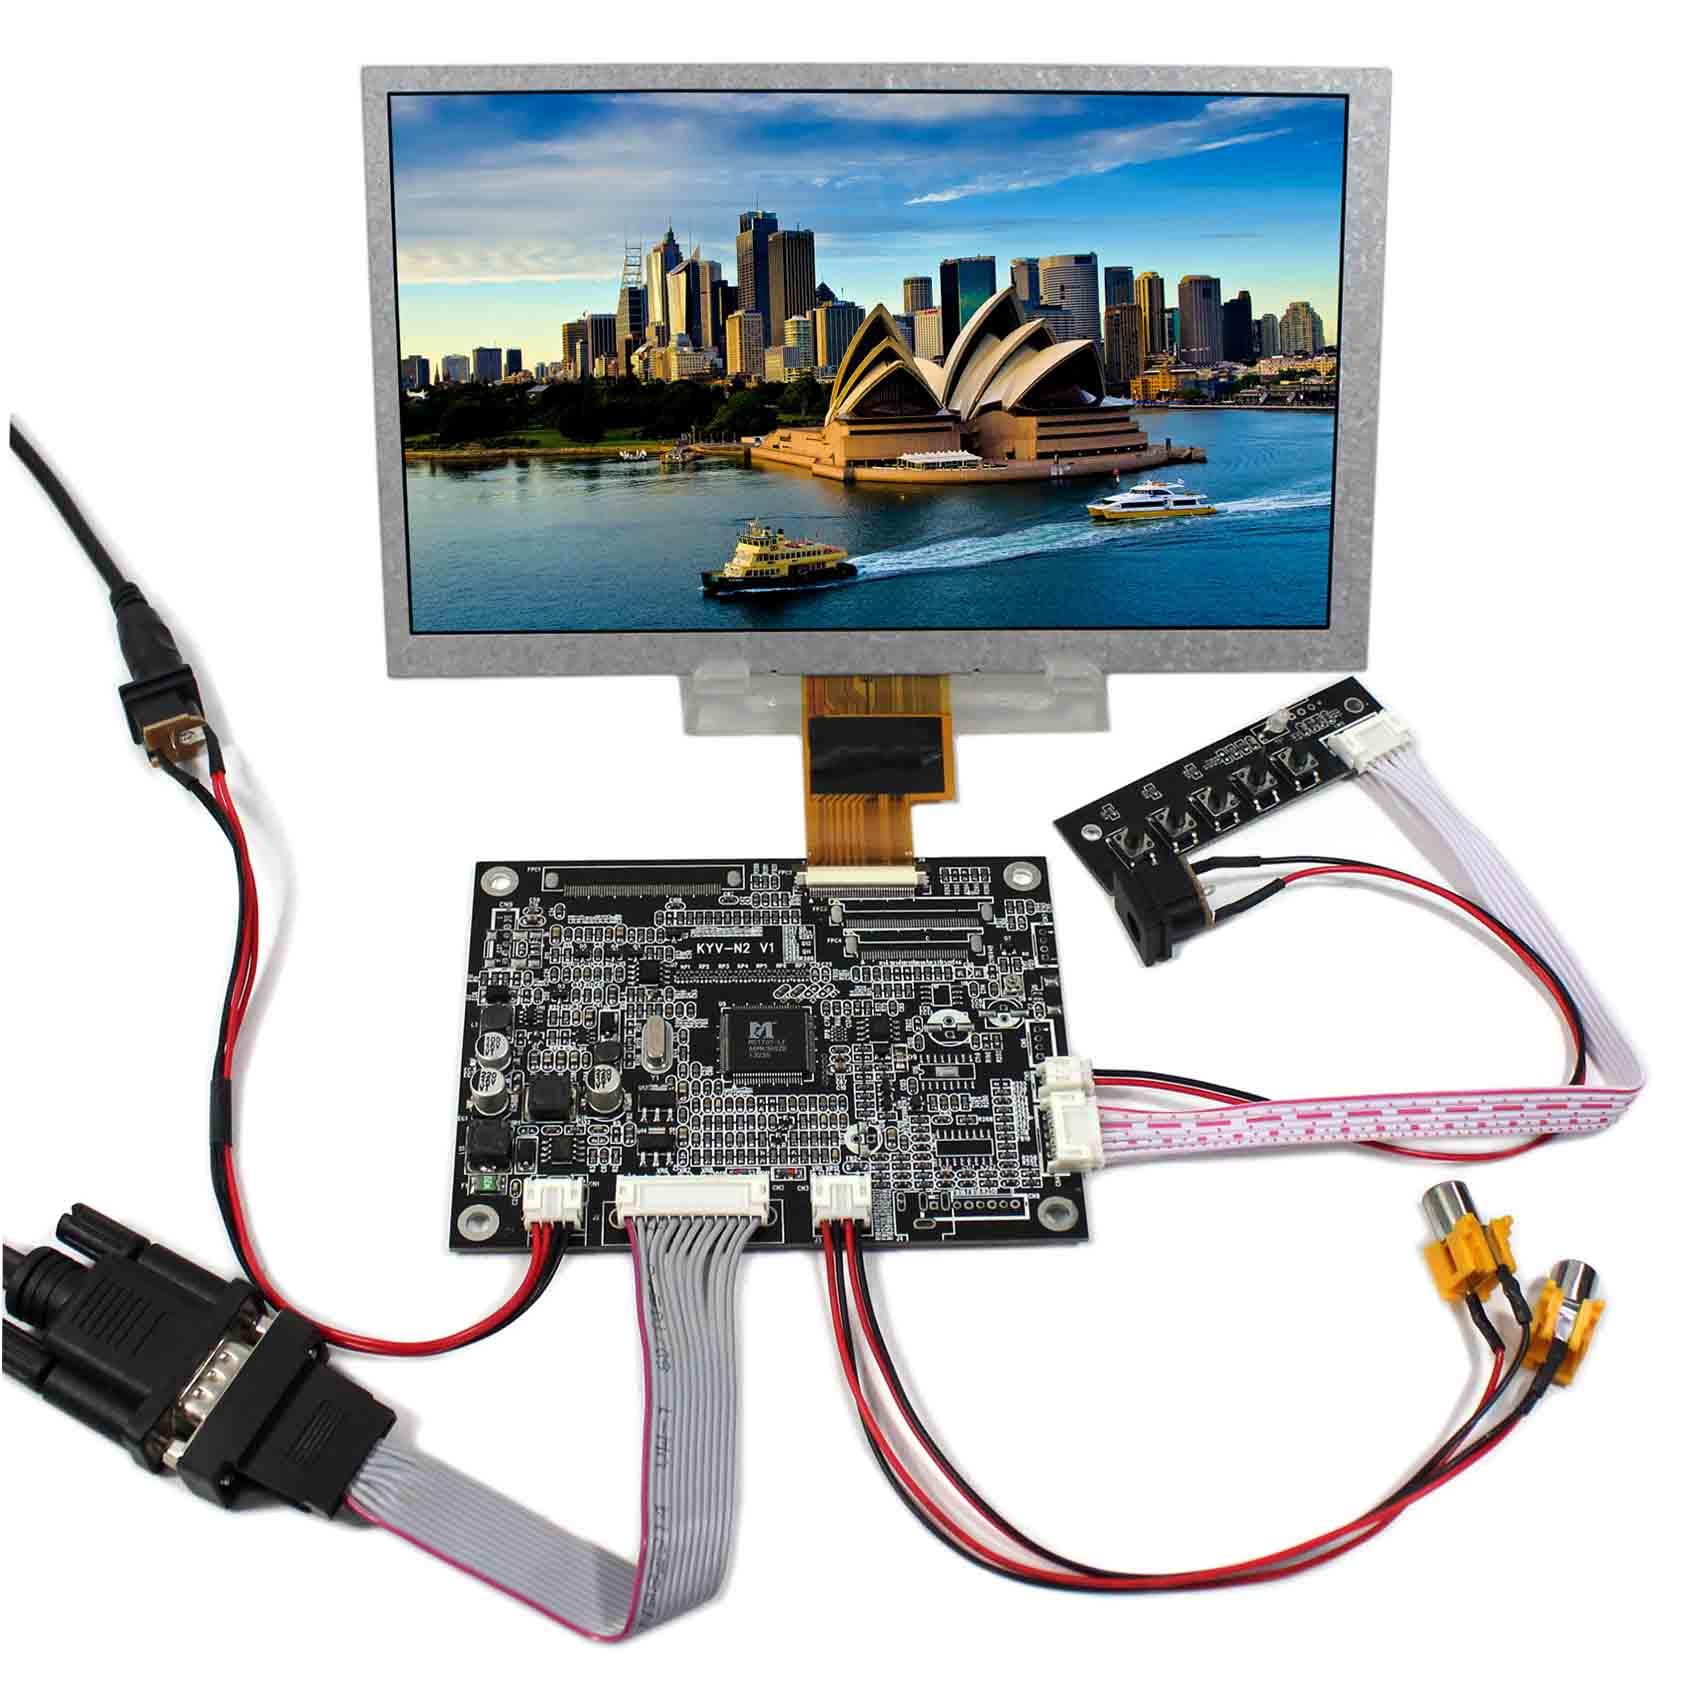 8inch ZJ080NA-08A 1024x600 LCD Screen+VGA 2AV Reversing LCD Controller Board KYV-N2 V1 vga 2av reversing lcd controller board with 7inch 1024x600 at070tna2 lcd screen